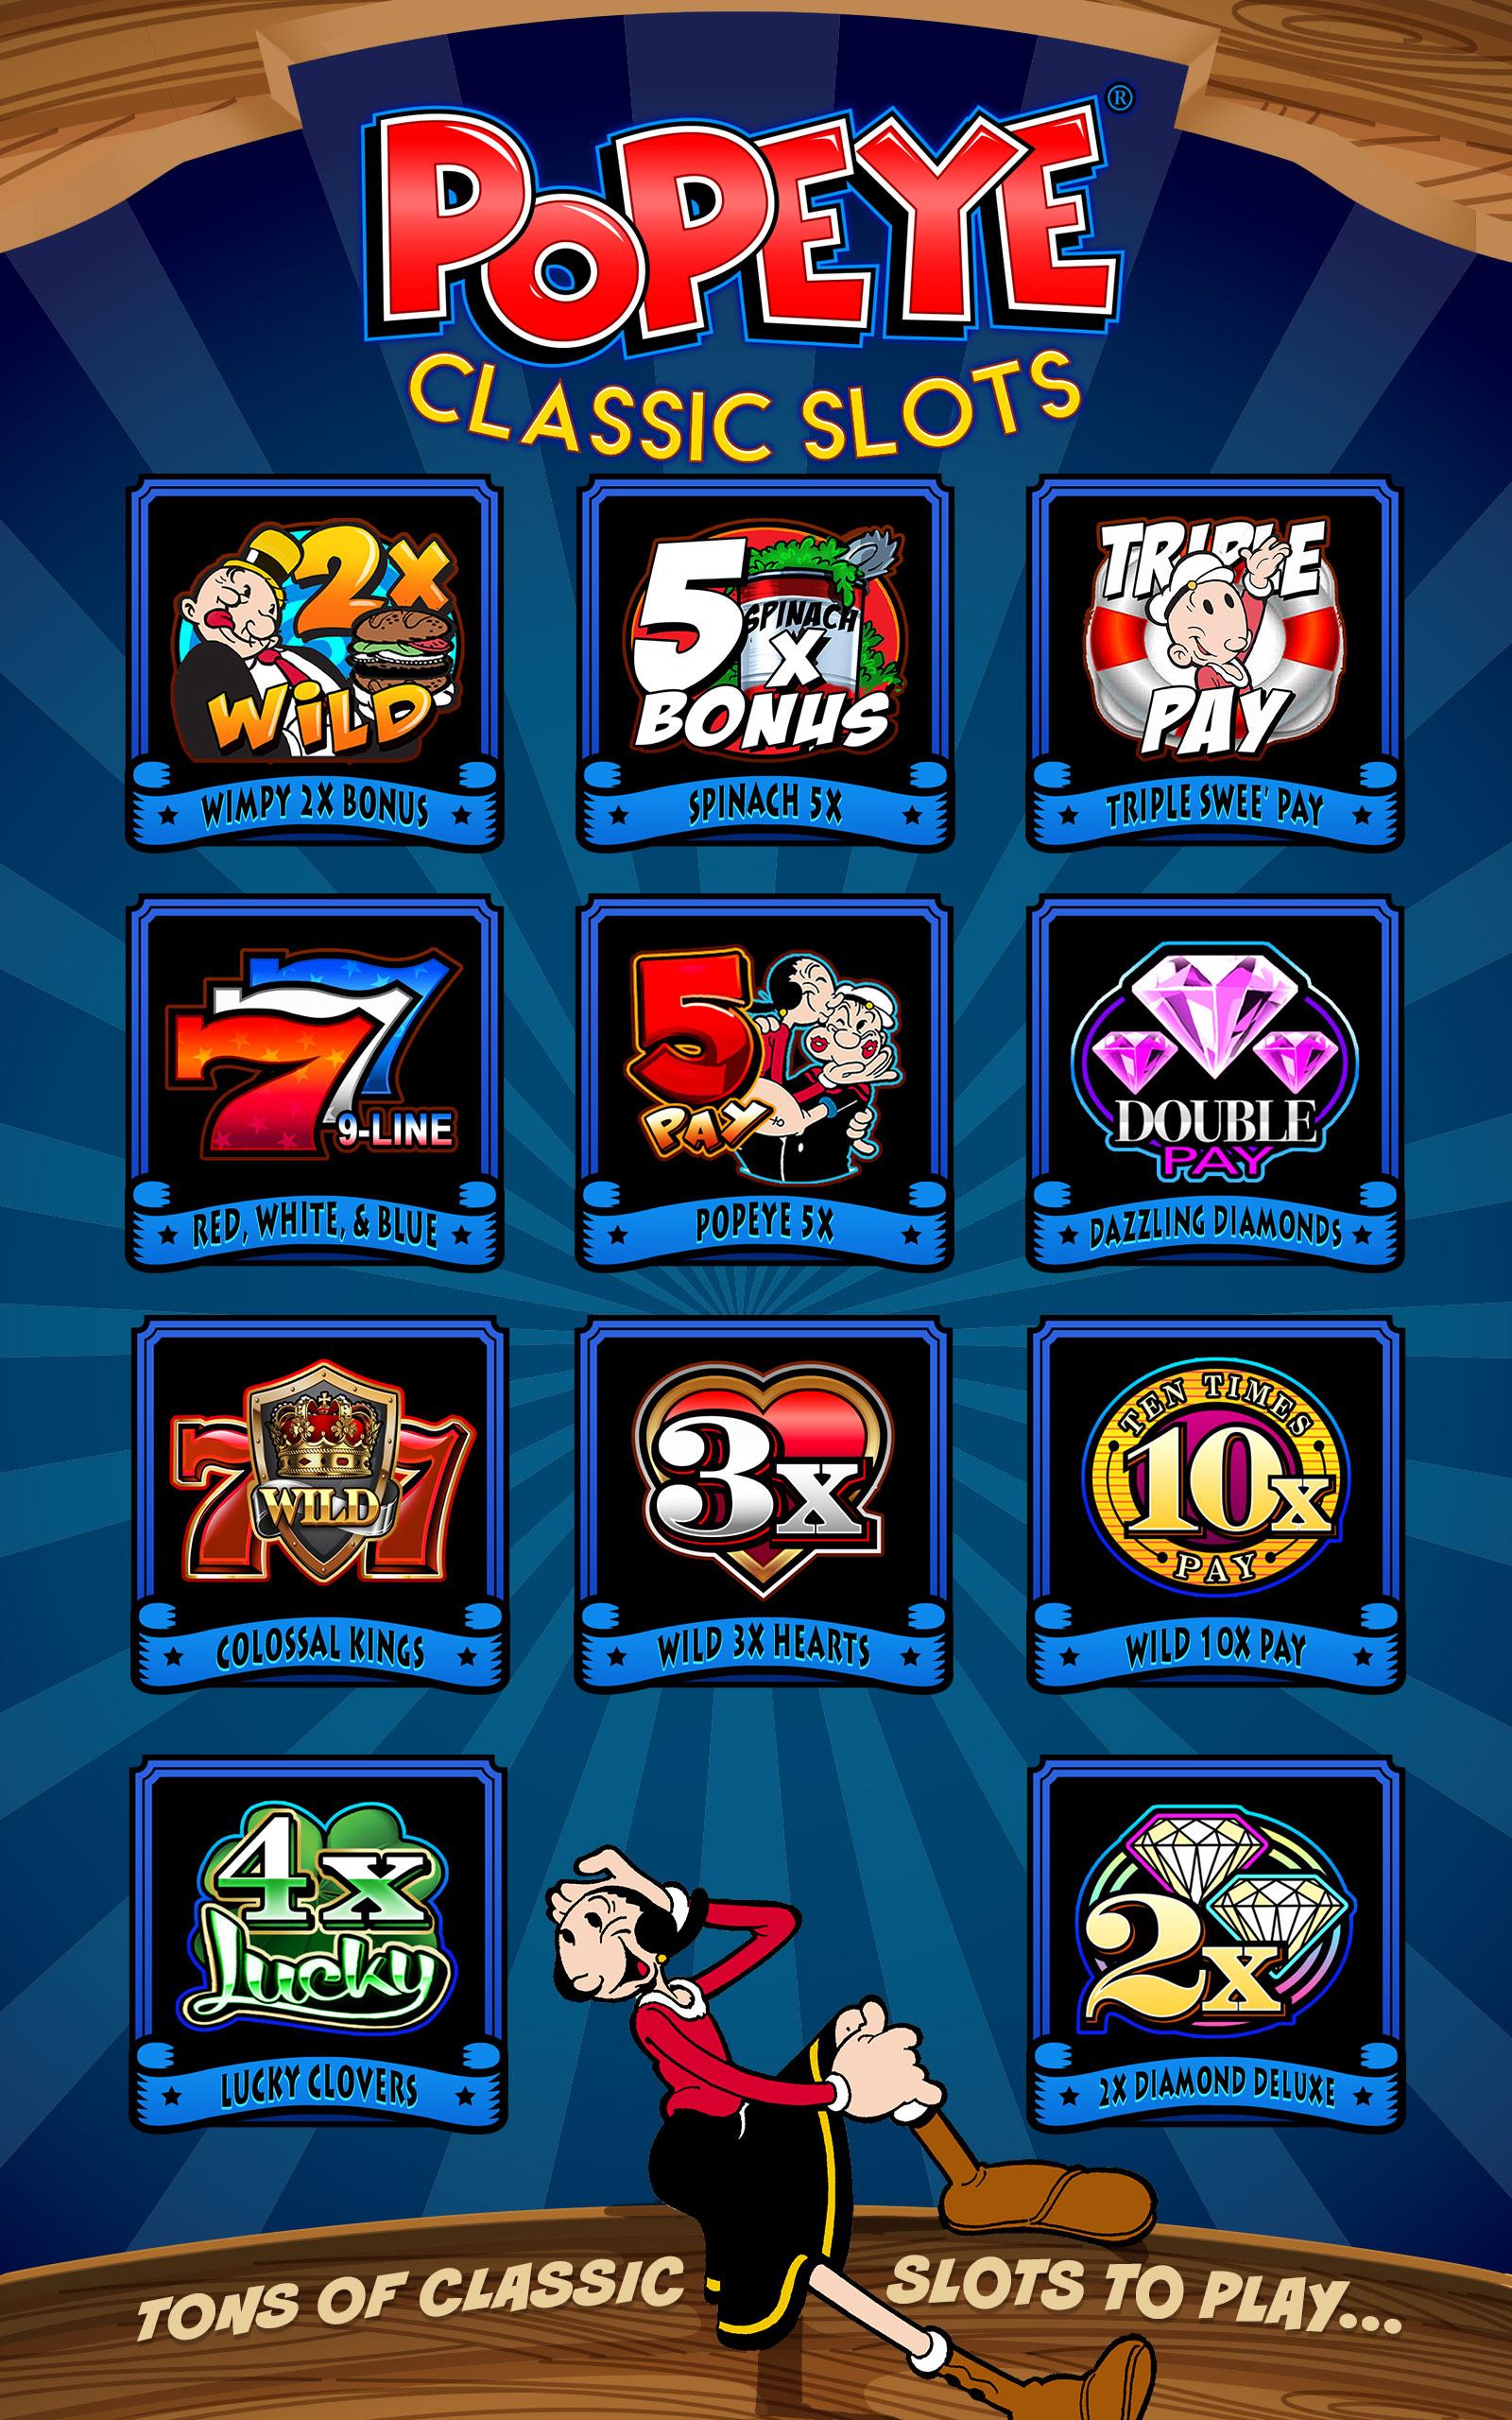 Wild Gambler - 21060